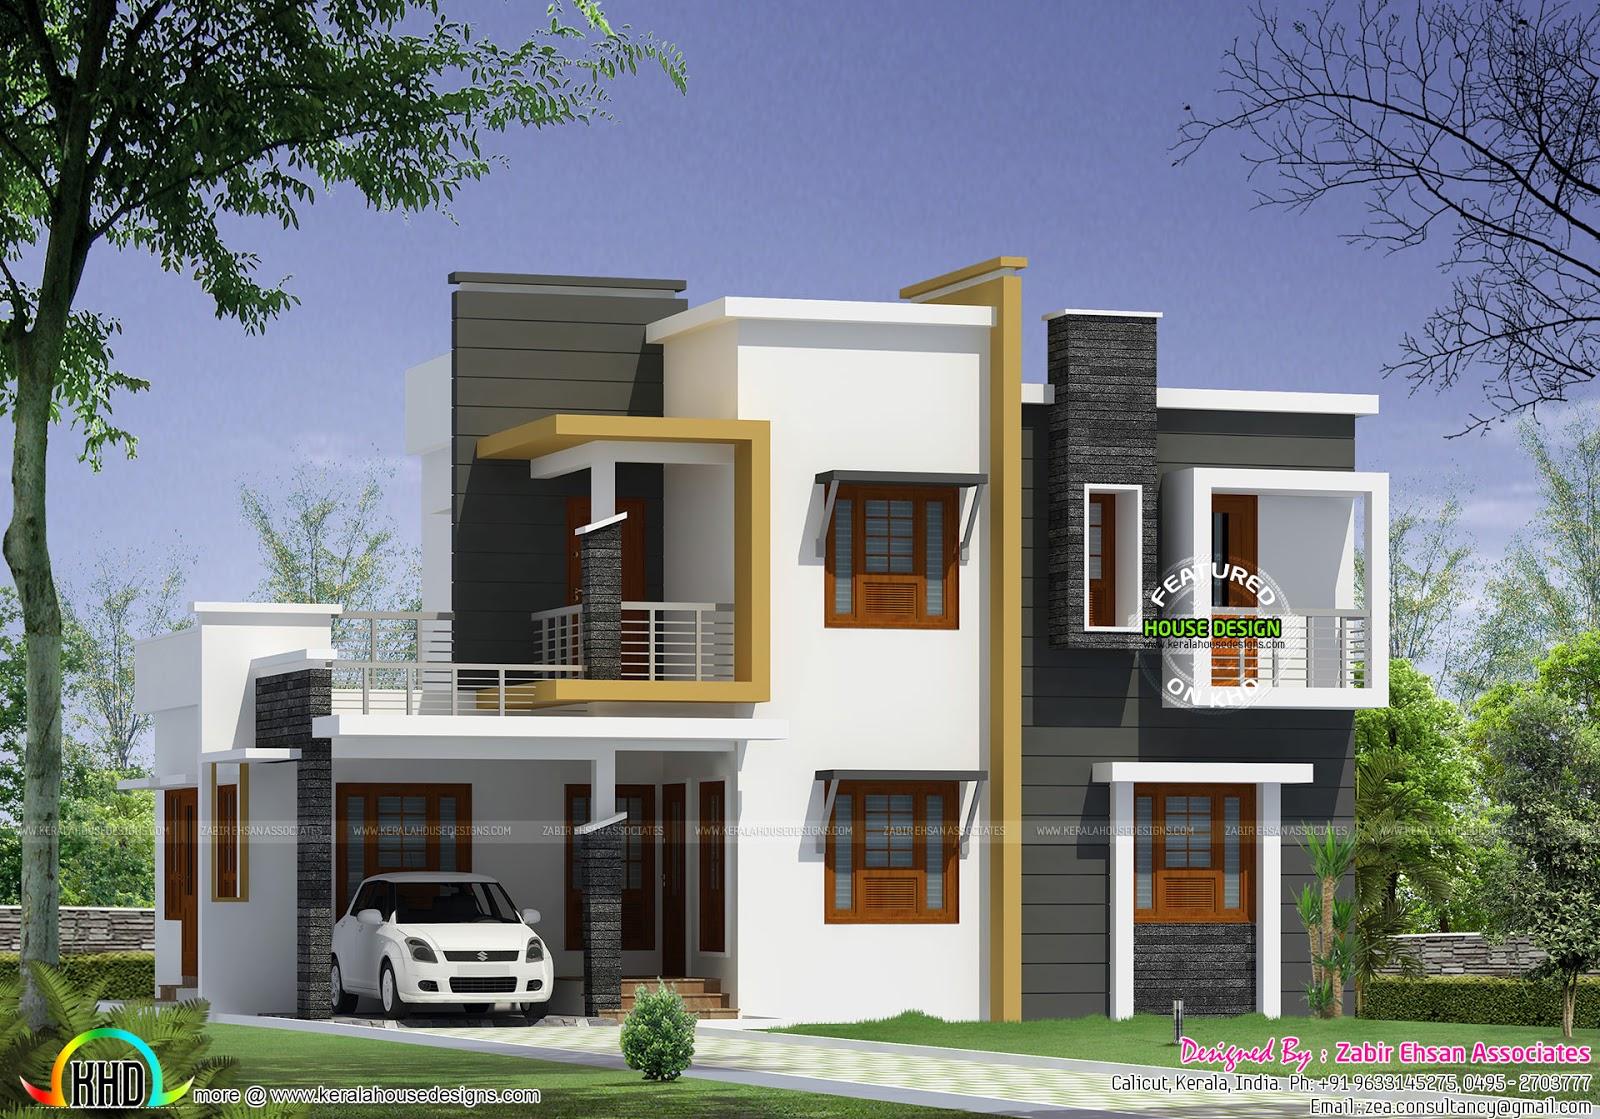 Box type modern house plan - Kerala home design and floor ...